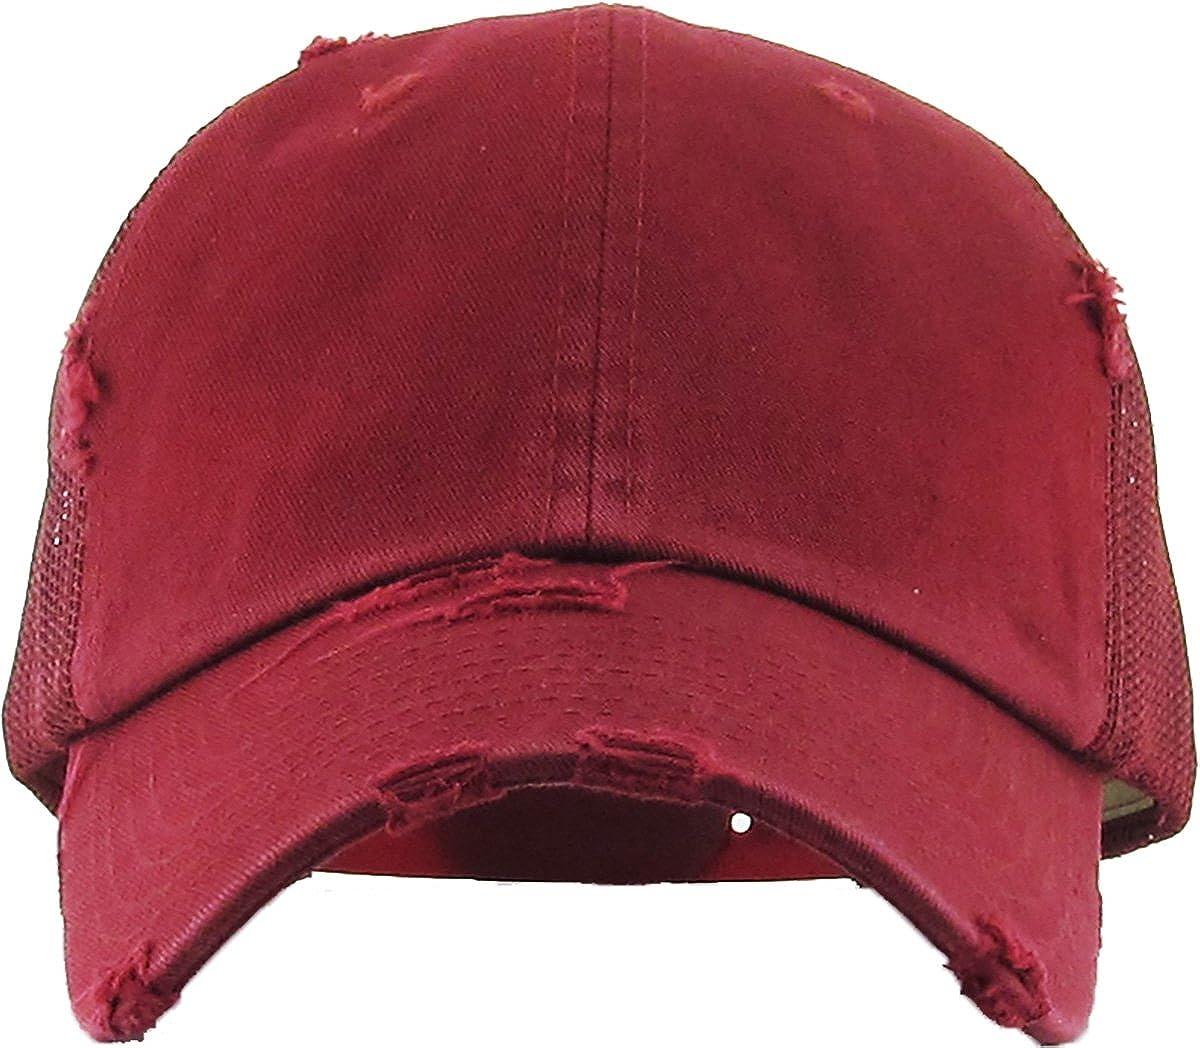 ... KBETHOS Vintage Washed Mesh Back Cotton Dad Trucker Hat Baseball Cap  Polo Style KBE-VM ... d0c8425e8d3e